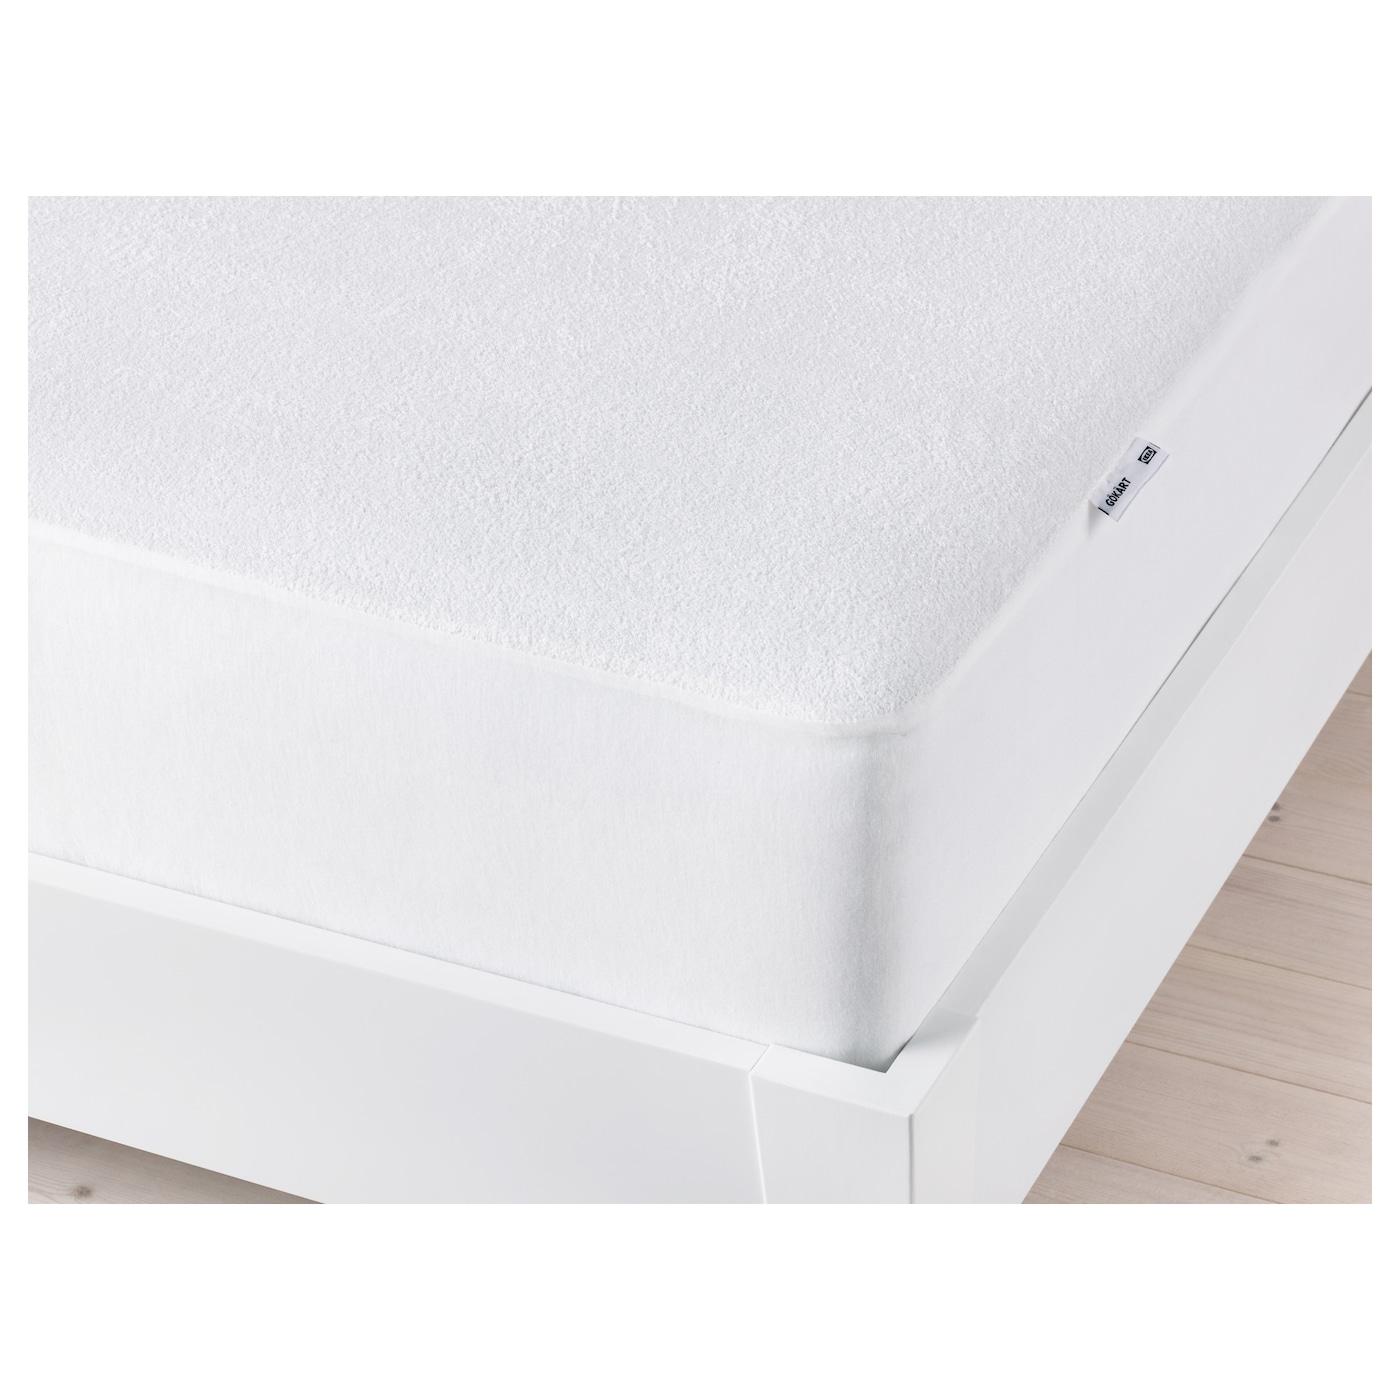 Ikea Single Bed Mattress Protector